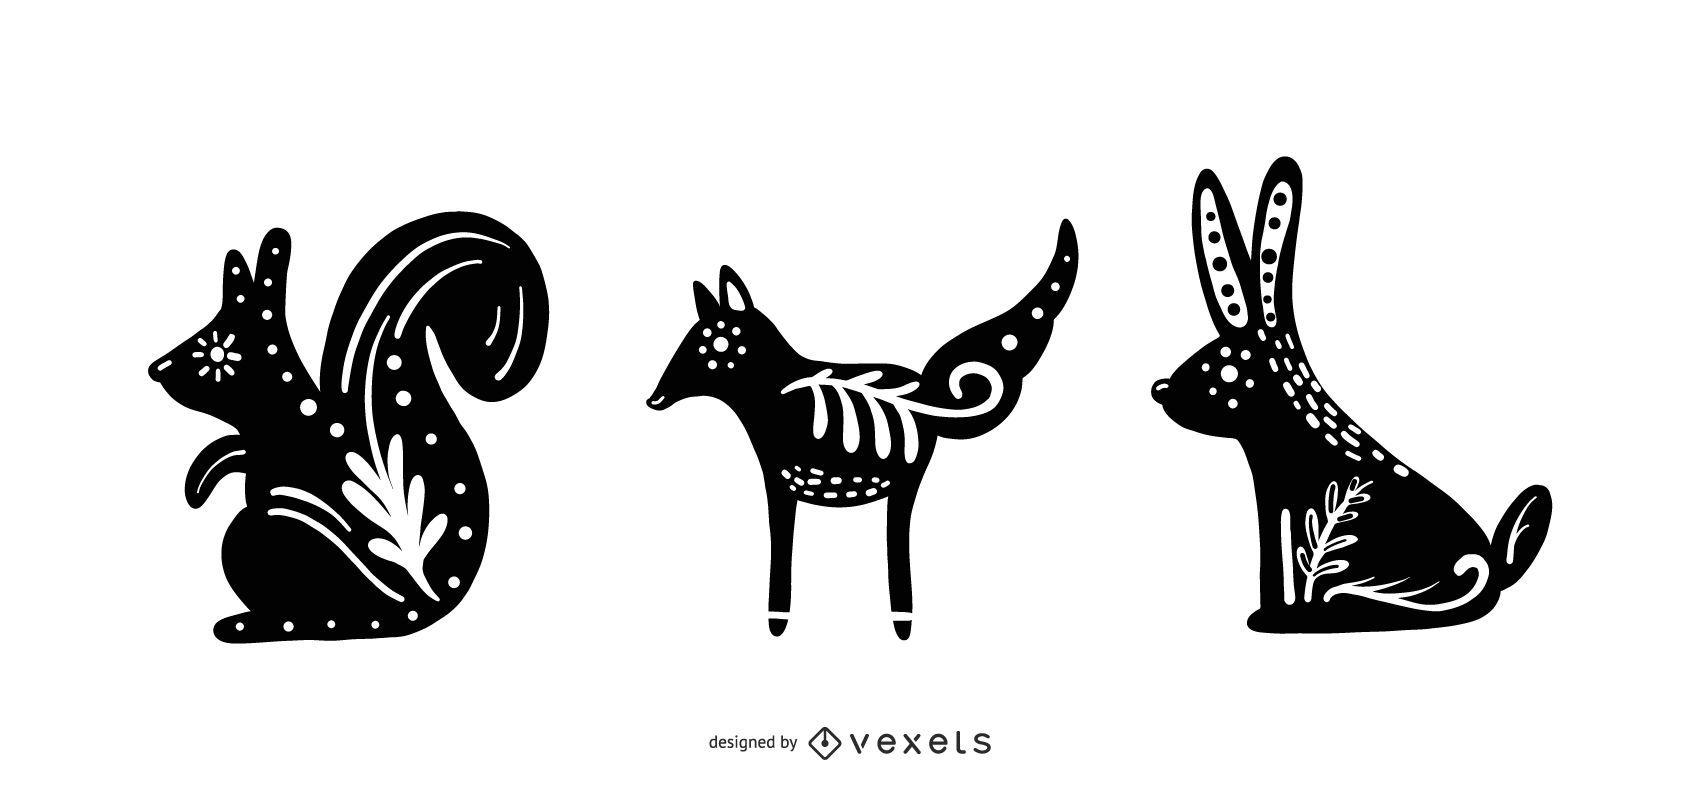 Scandinavian Folk Animal Silhouette Set